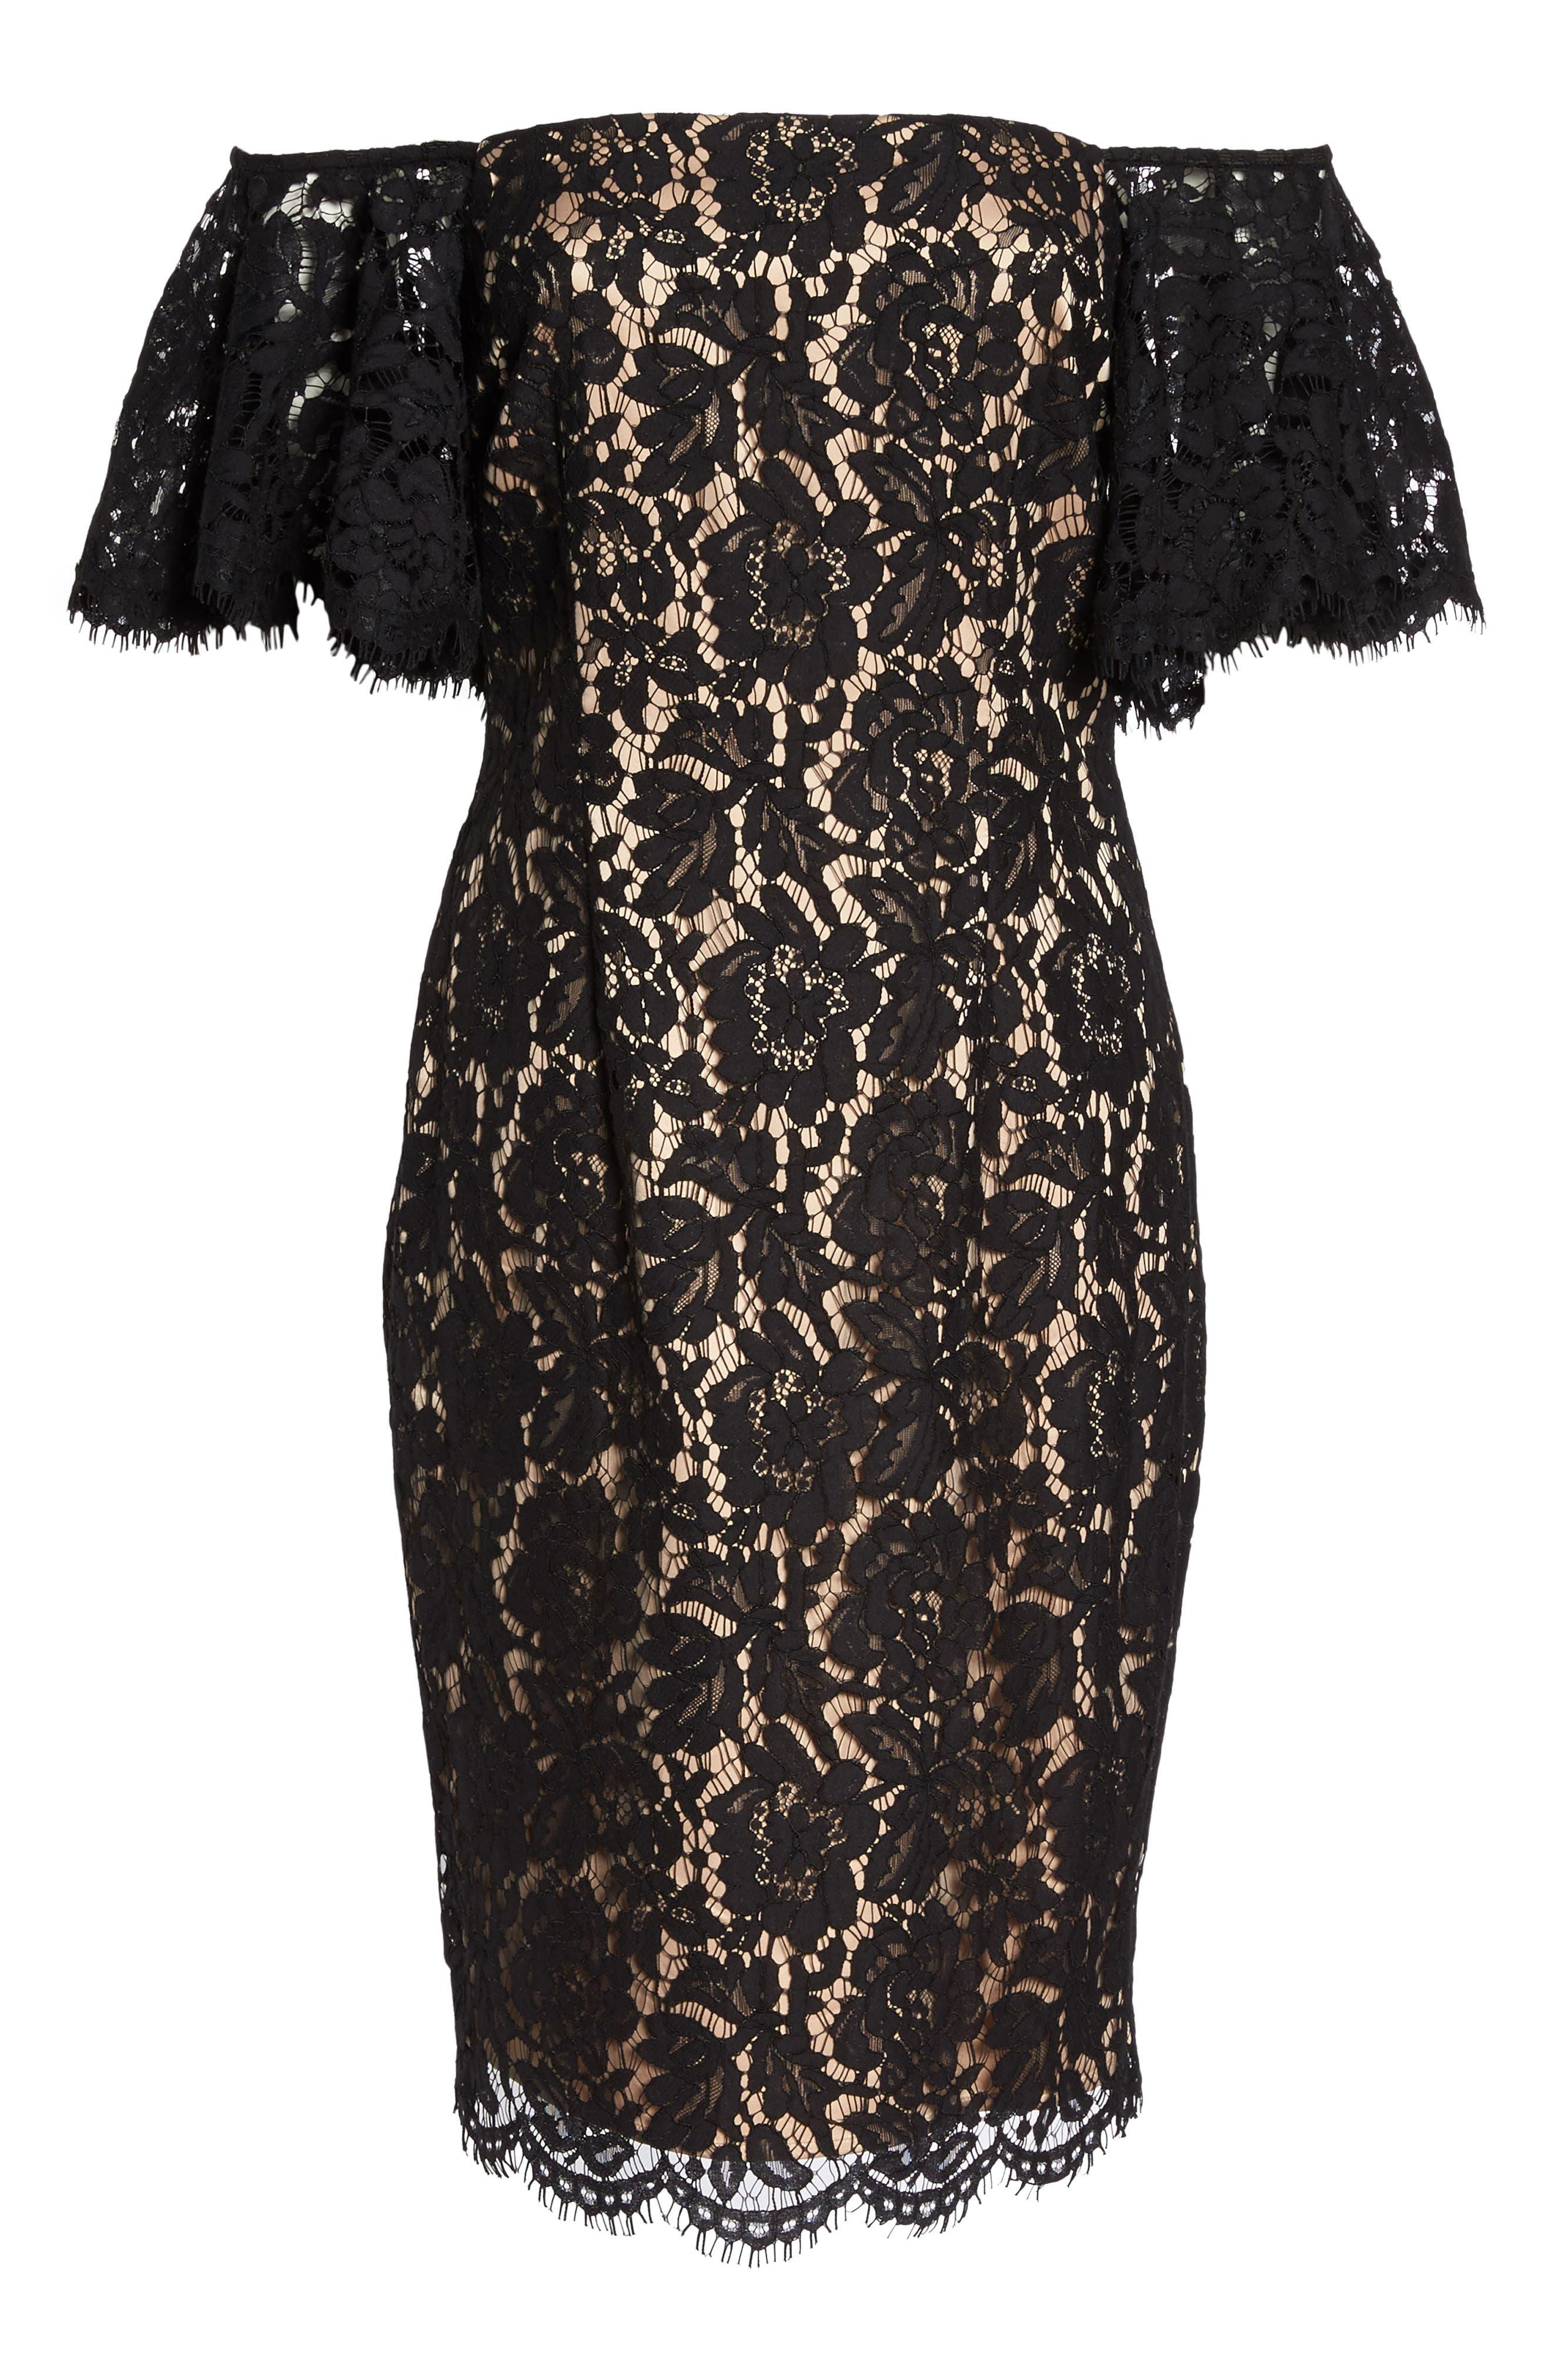 Off the Shoulder Lace Dress,                             Alternate thumbnail 6, color,                             Black/ Nude Combo